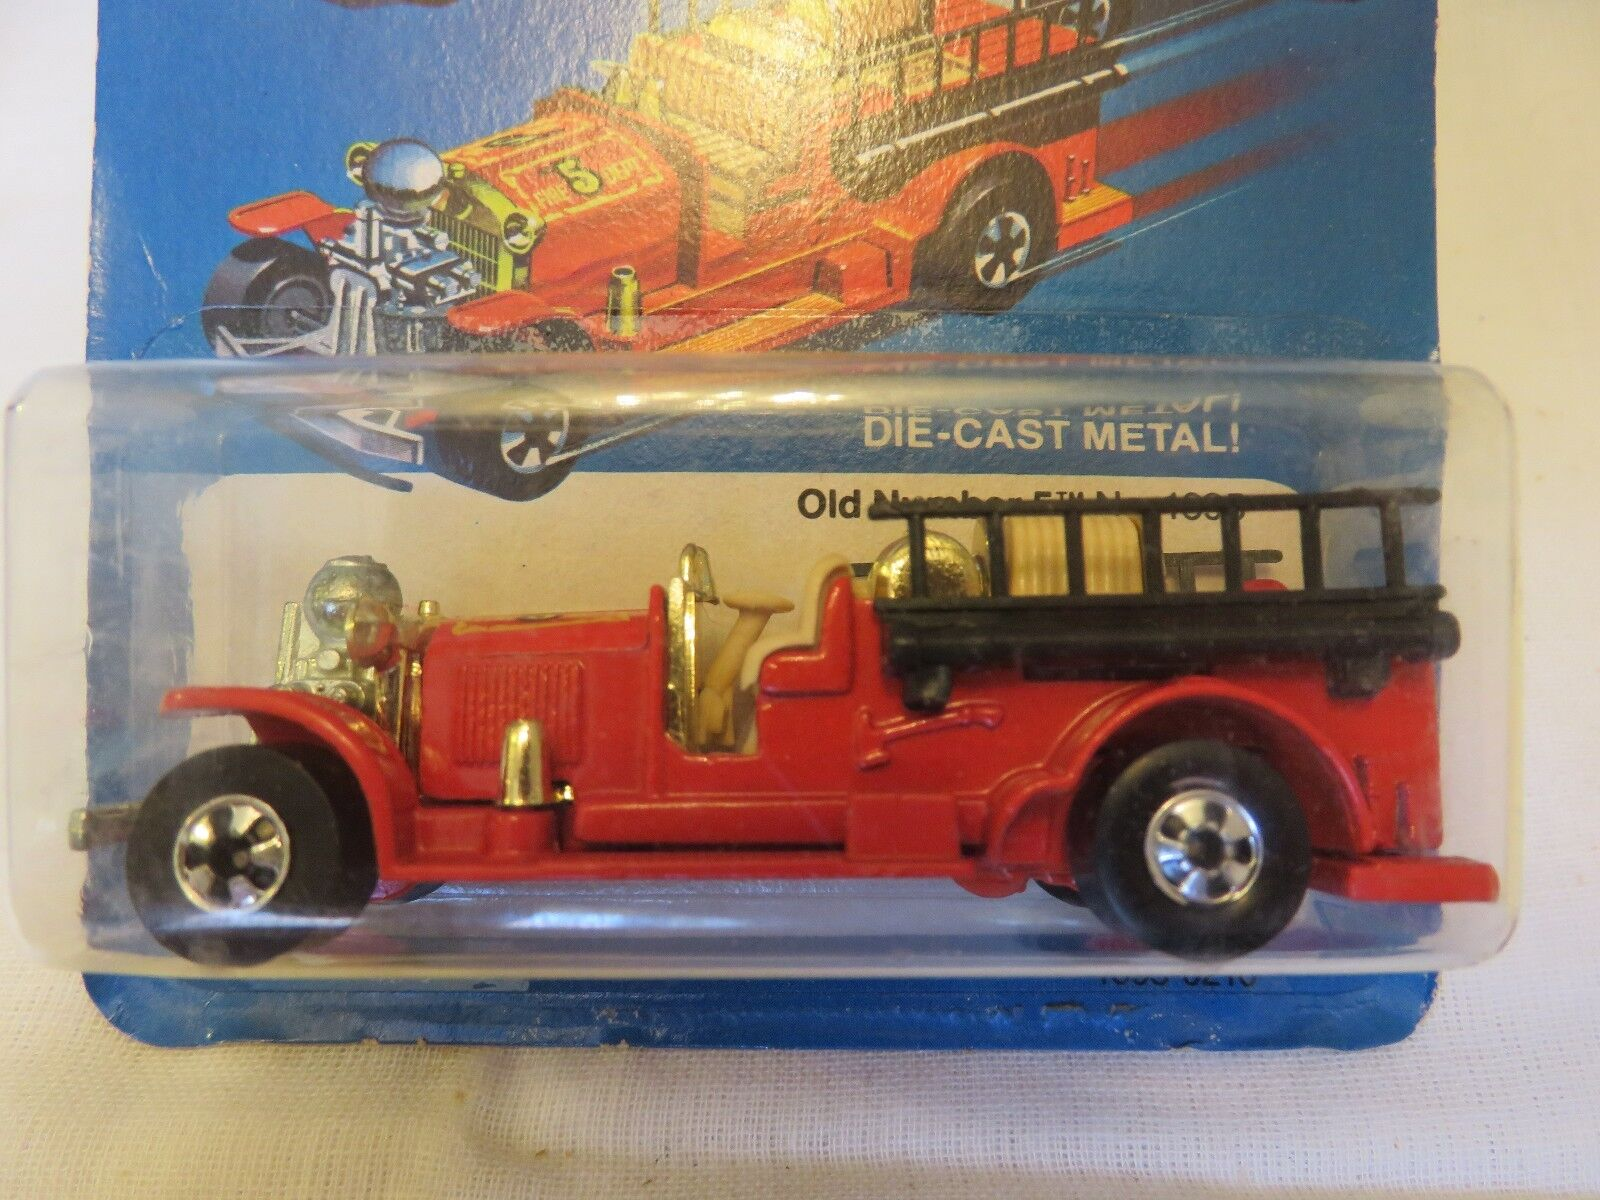 1981 VTG Hot Wheels Old Number 5 Fire Engine 1695 Red Hong Kong Die-Cast Car B